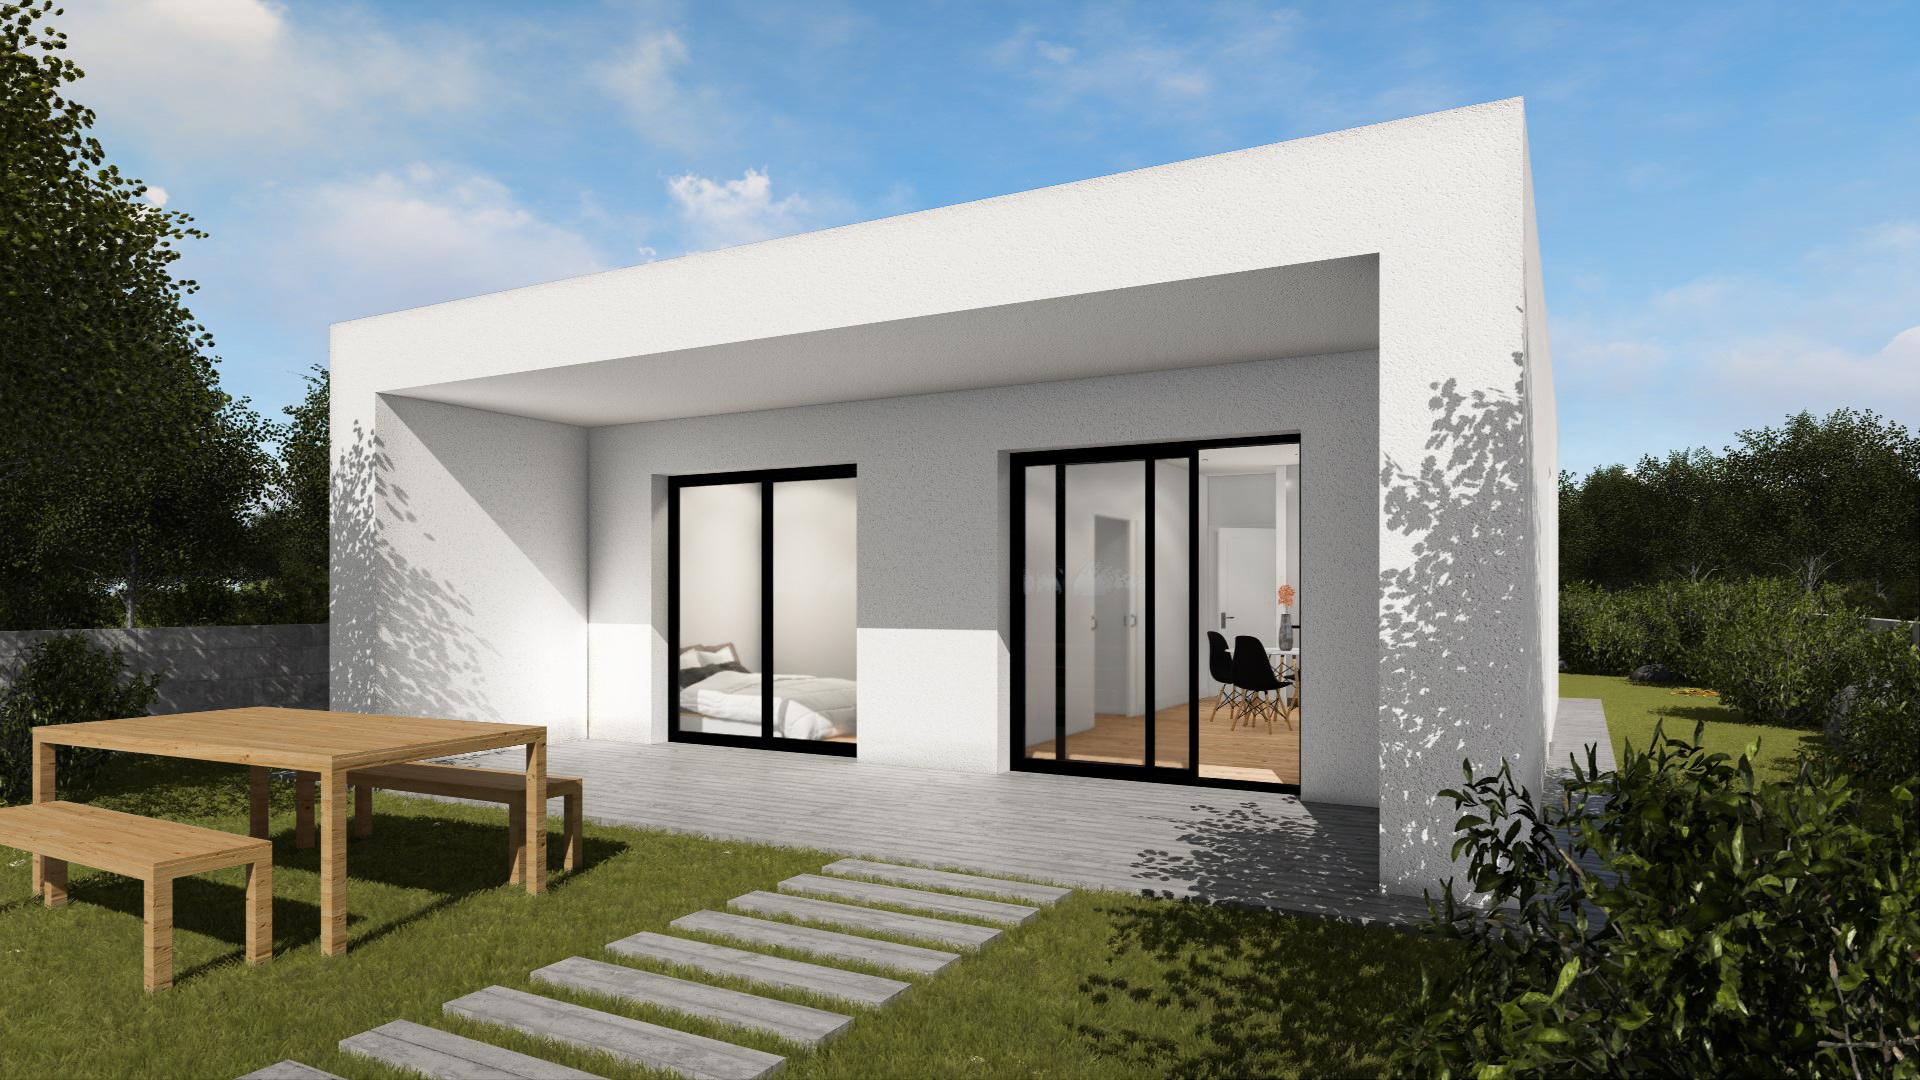 render exterior modelo de vivienda prefabricada besalu